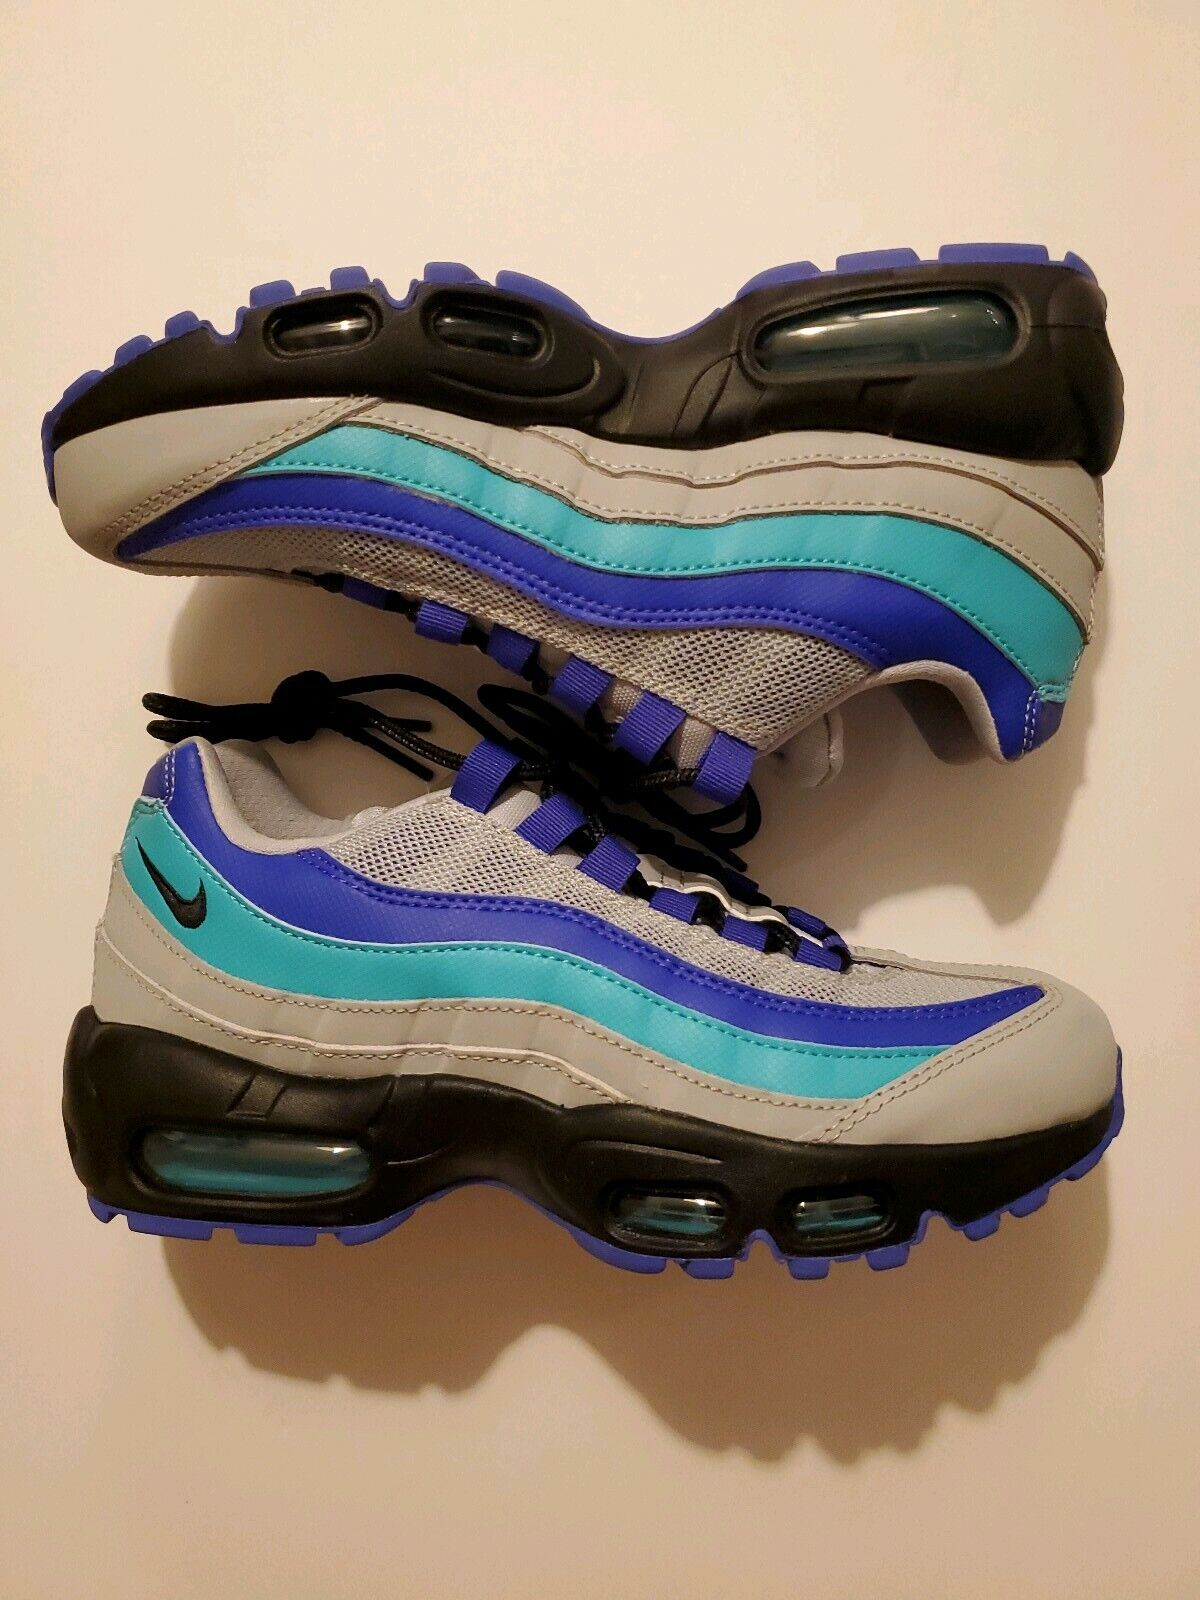 Nike Air Max 95 OG Men Size 4.5 Wolf Grey Black Indigo Burst Aqua 3M AT2865-001